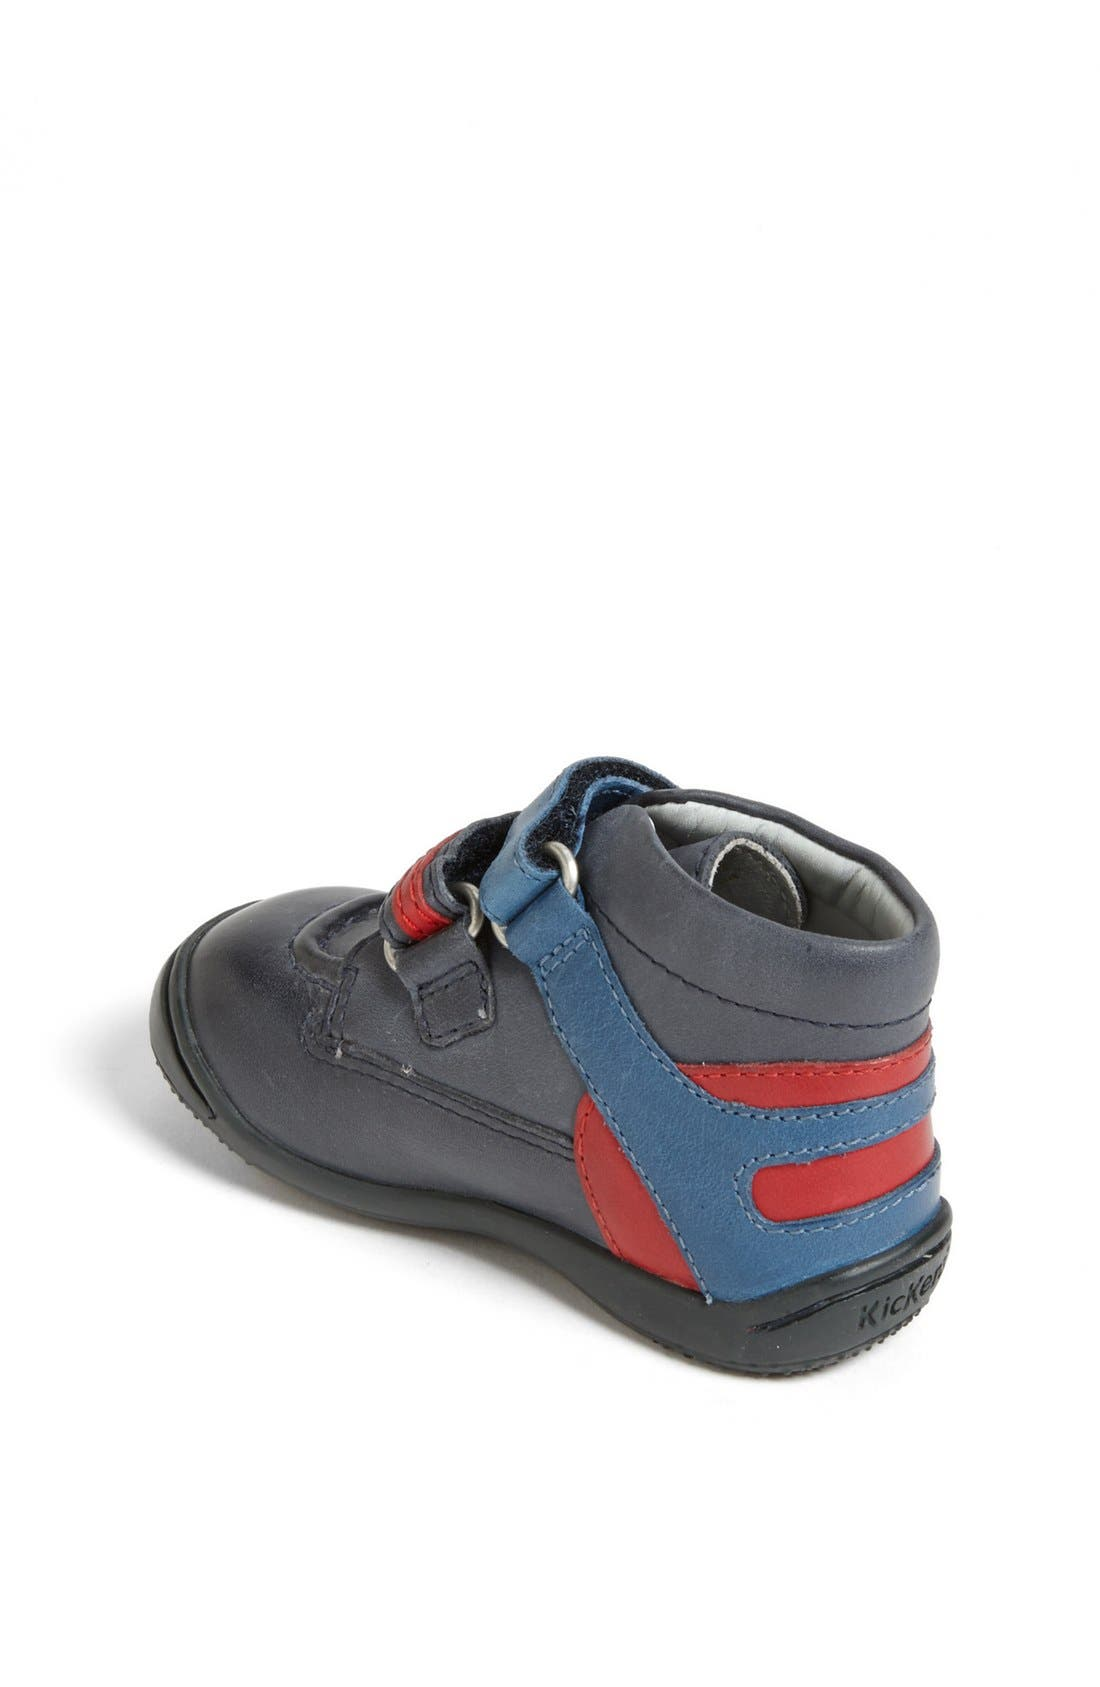 Alternate Image 2  - Kickers 'Geneva' Boot (Baby, Walker & Toddler)